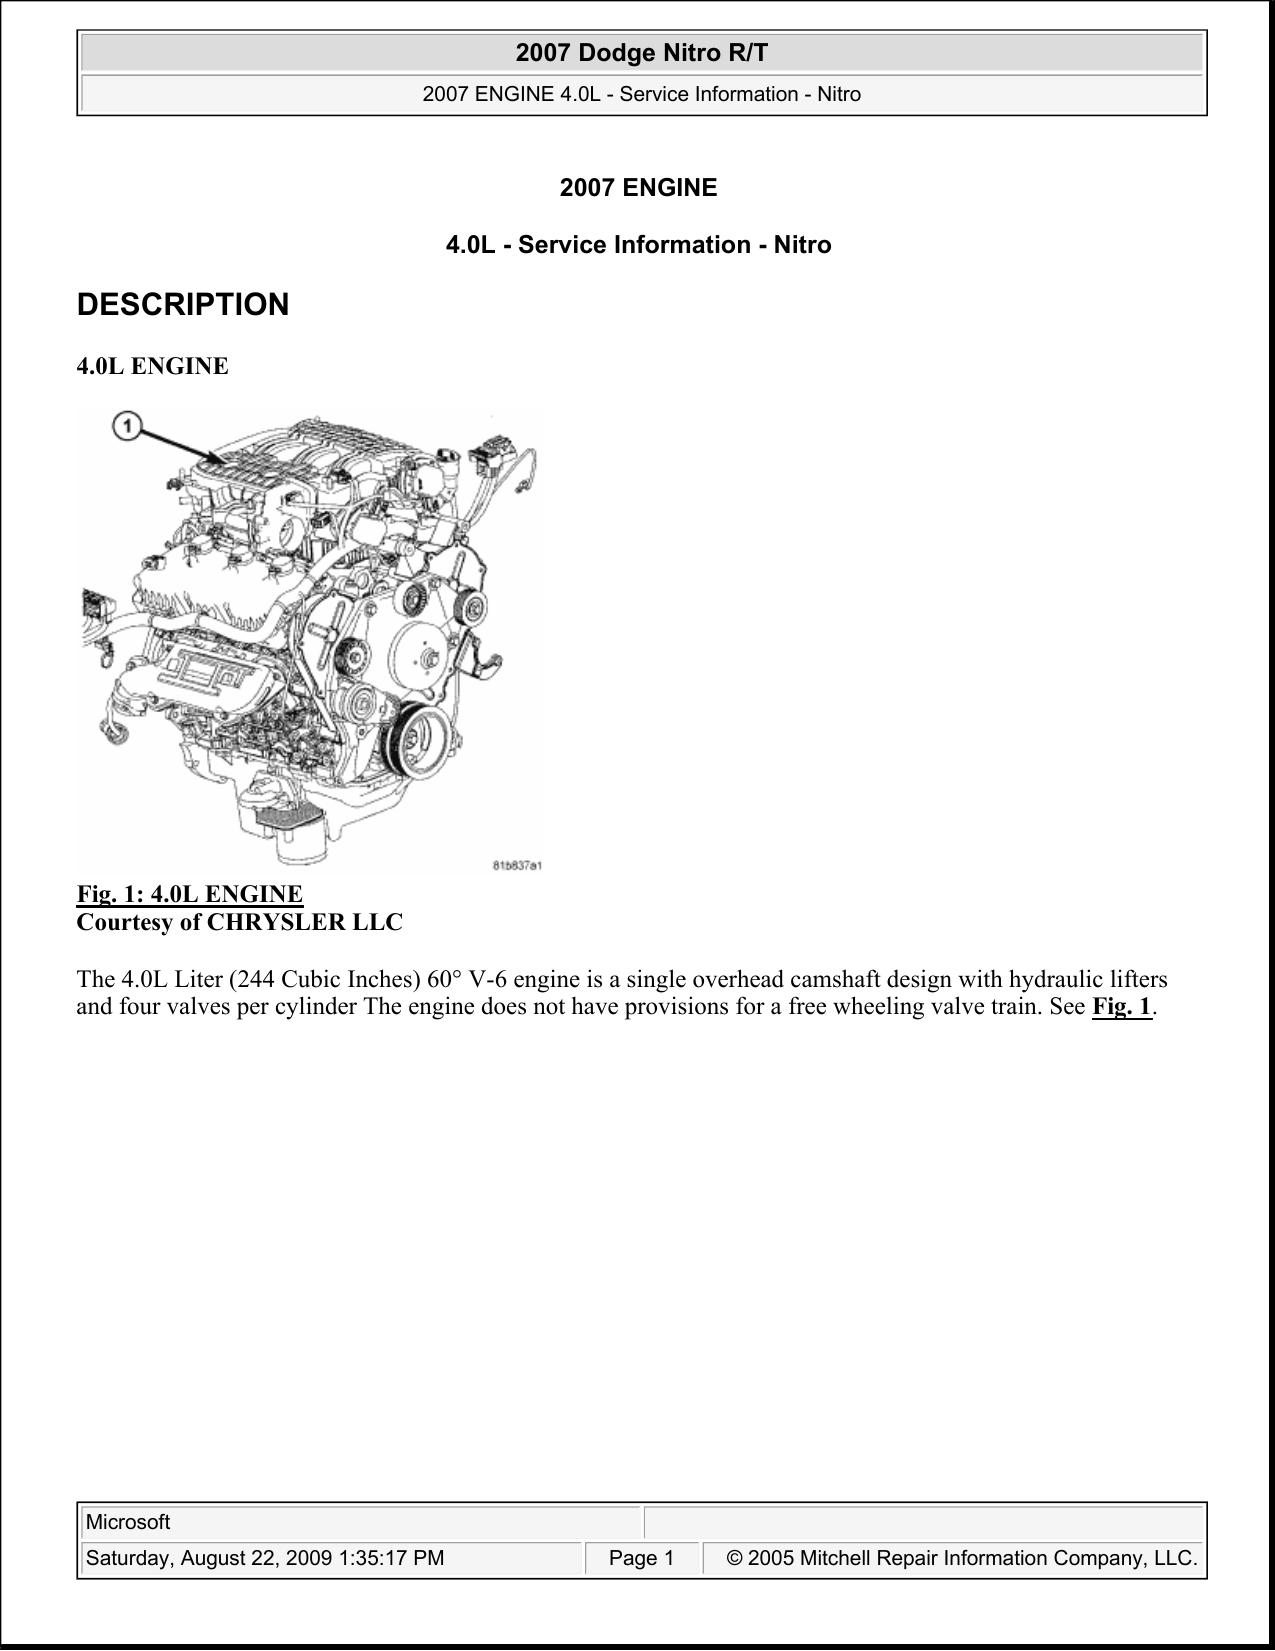 4.0L Engine - Gruppo Radicale Basilea | Manualzz